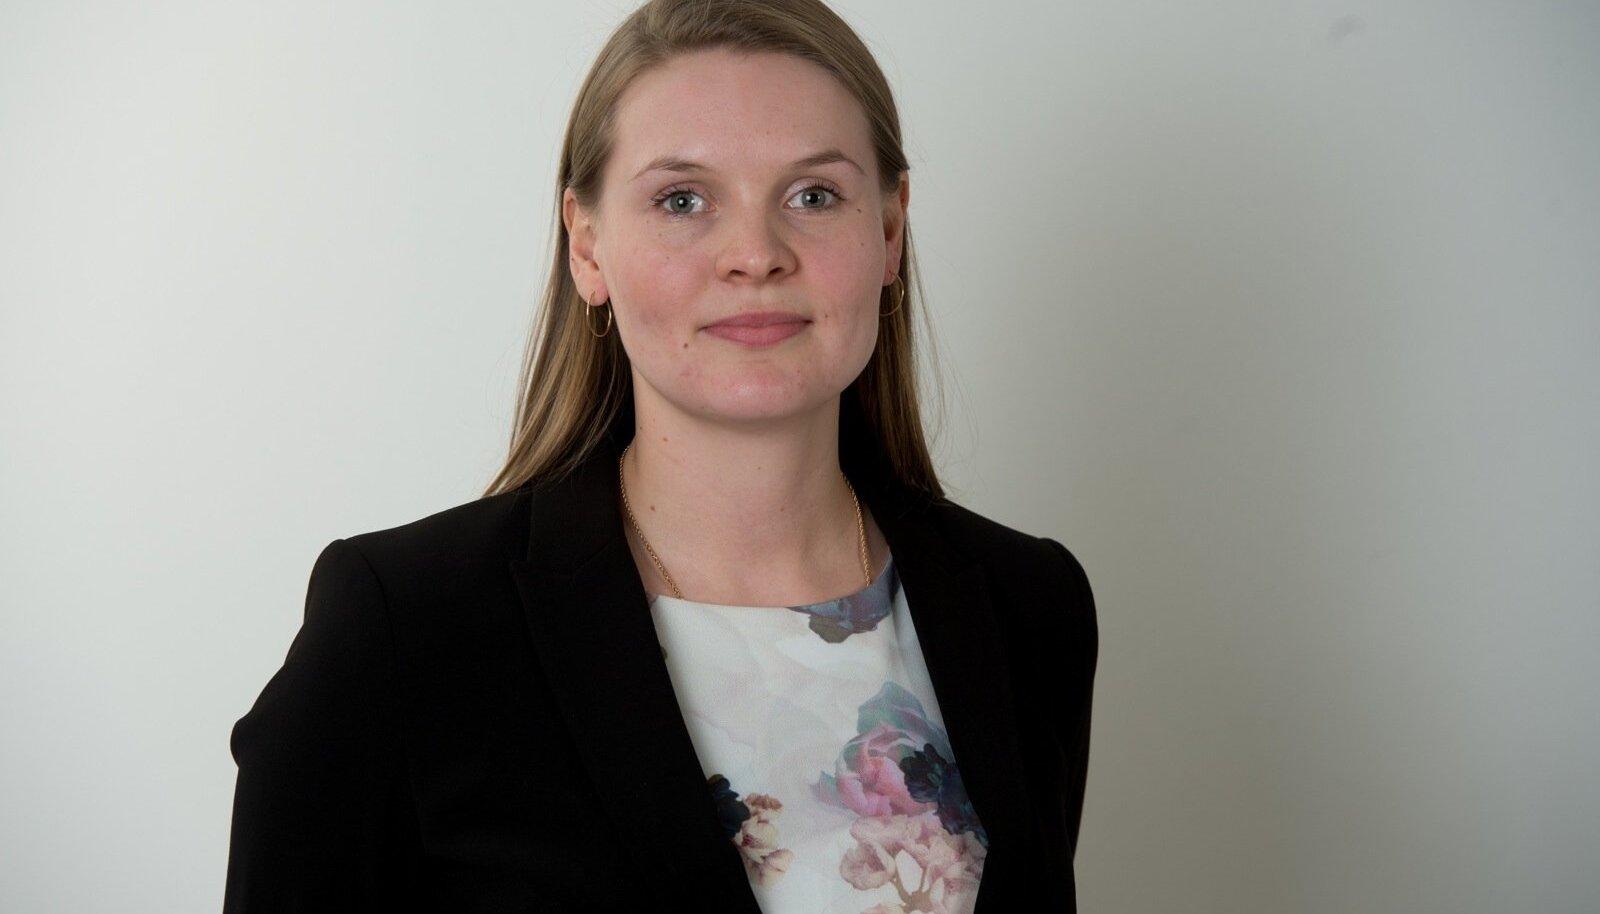 Linda Eichler